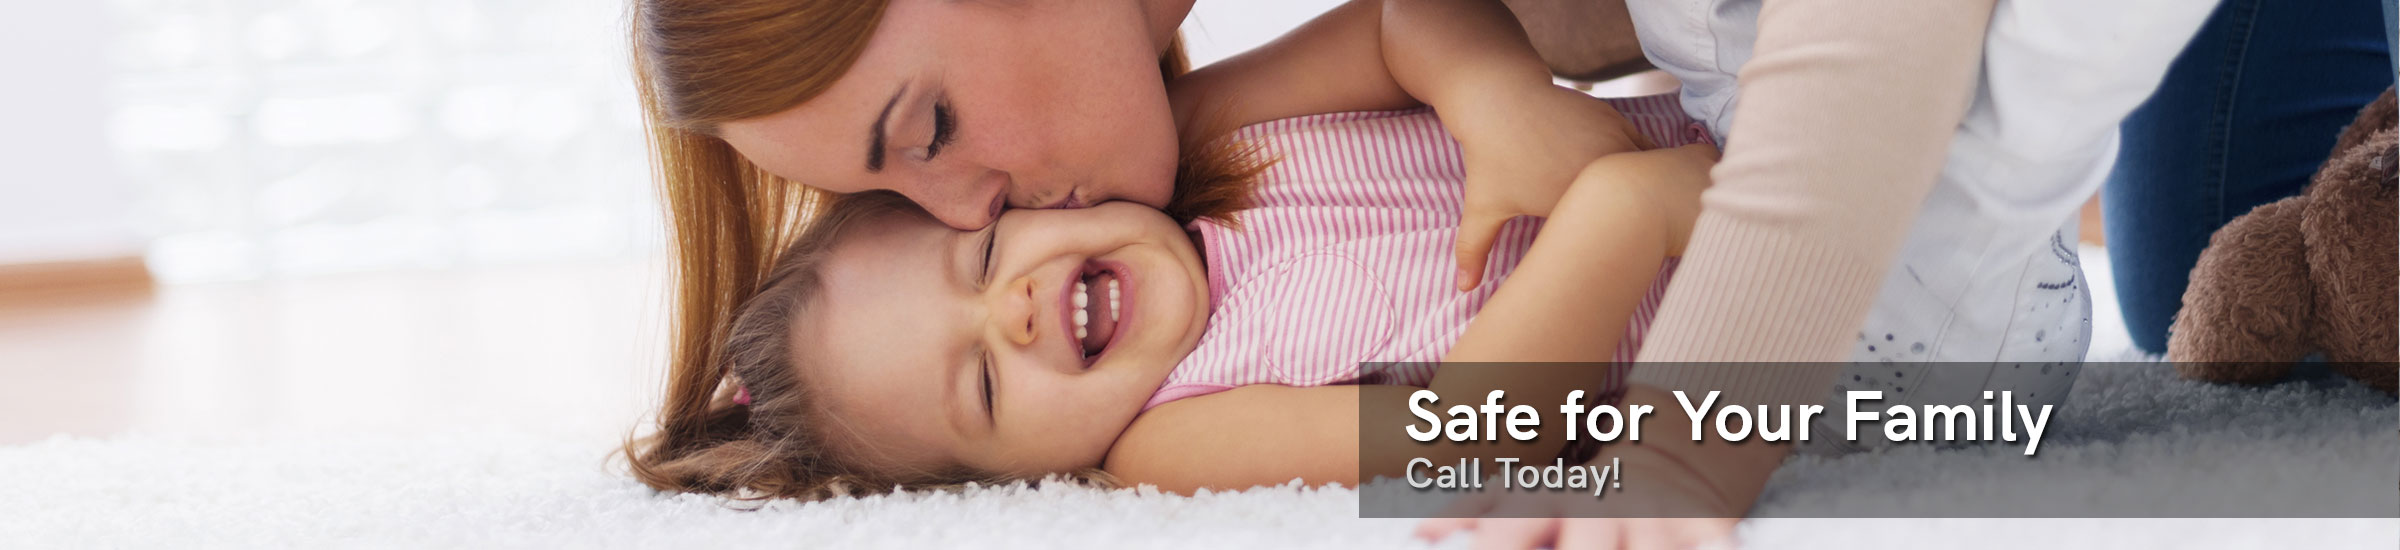 cc–safe-for-family